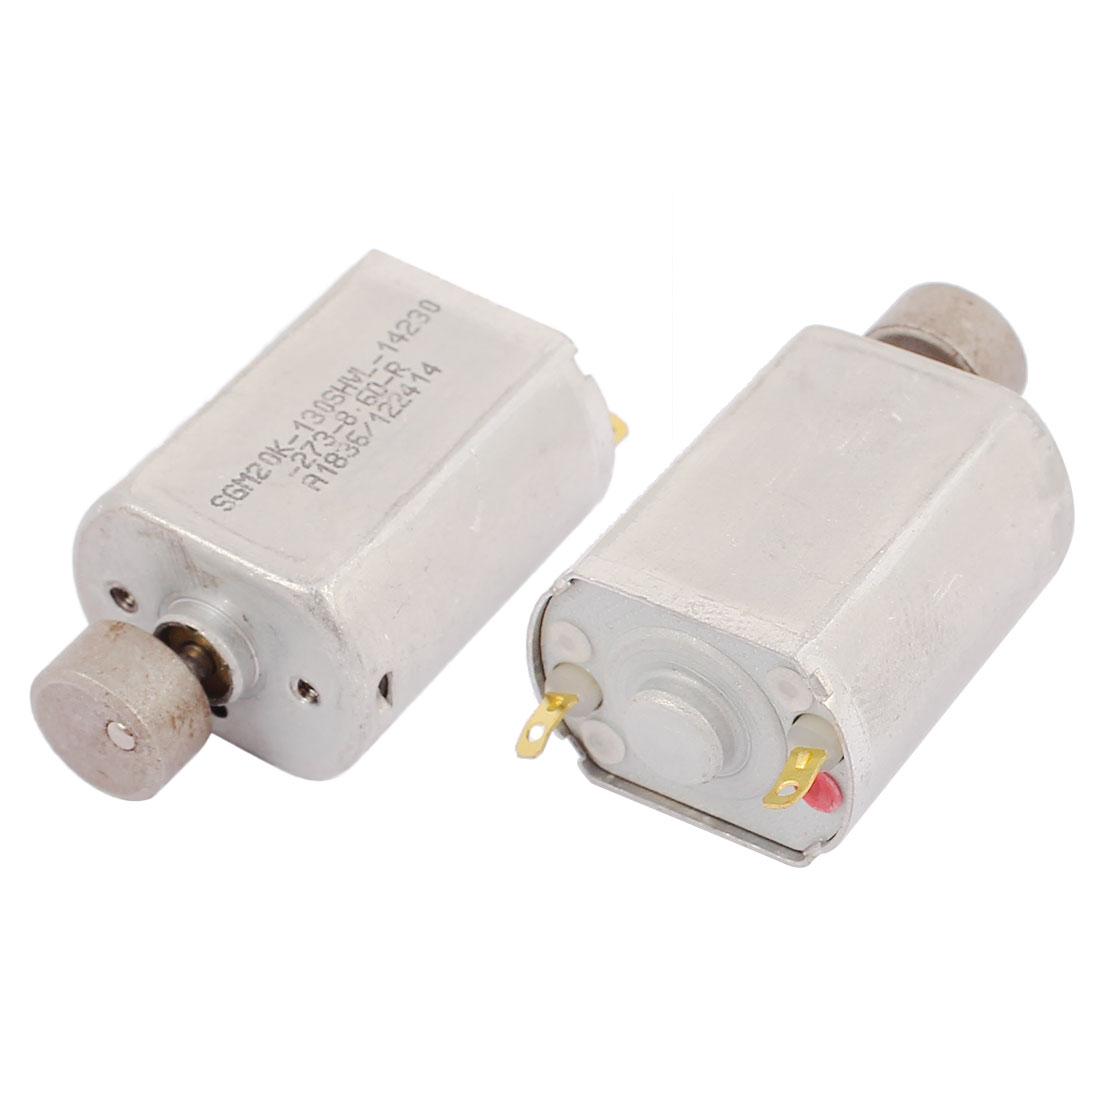 2Pcs DC 1.5-6V 12000RPM Large Torque Micro Vibration DC Motor for Electric Massage